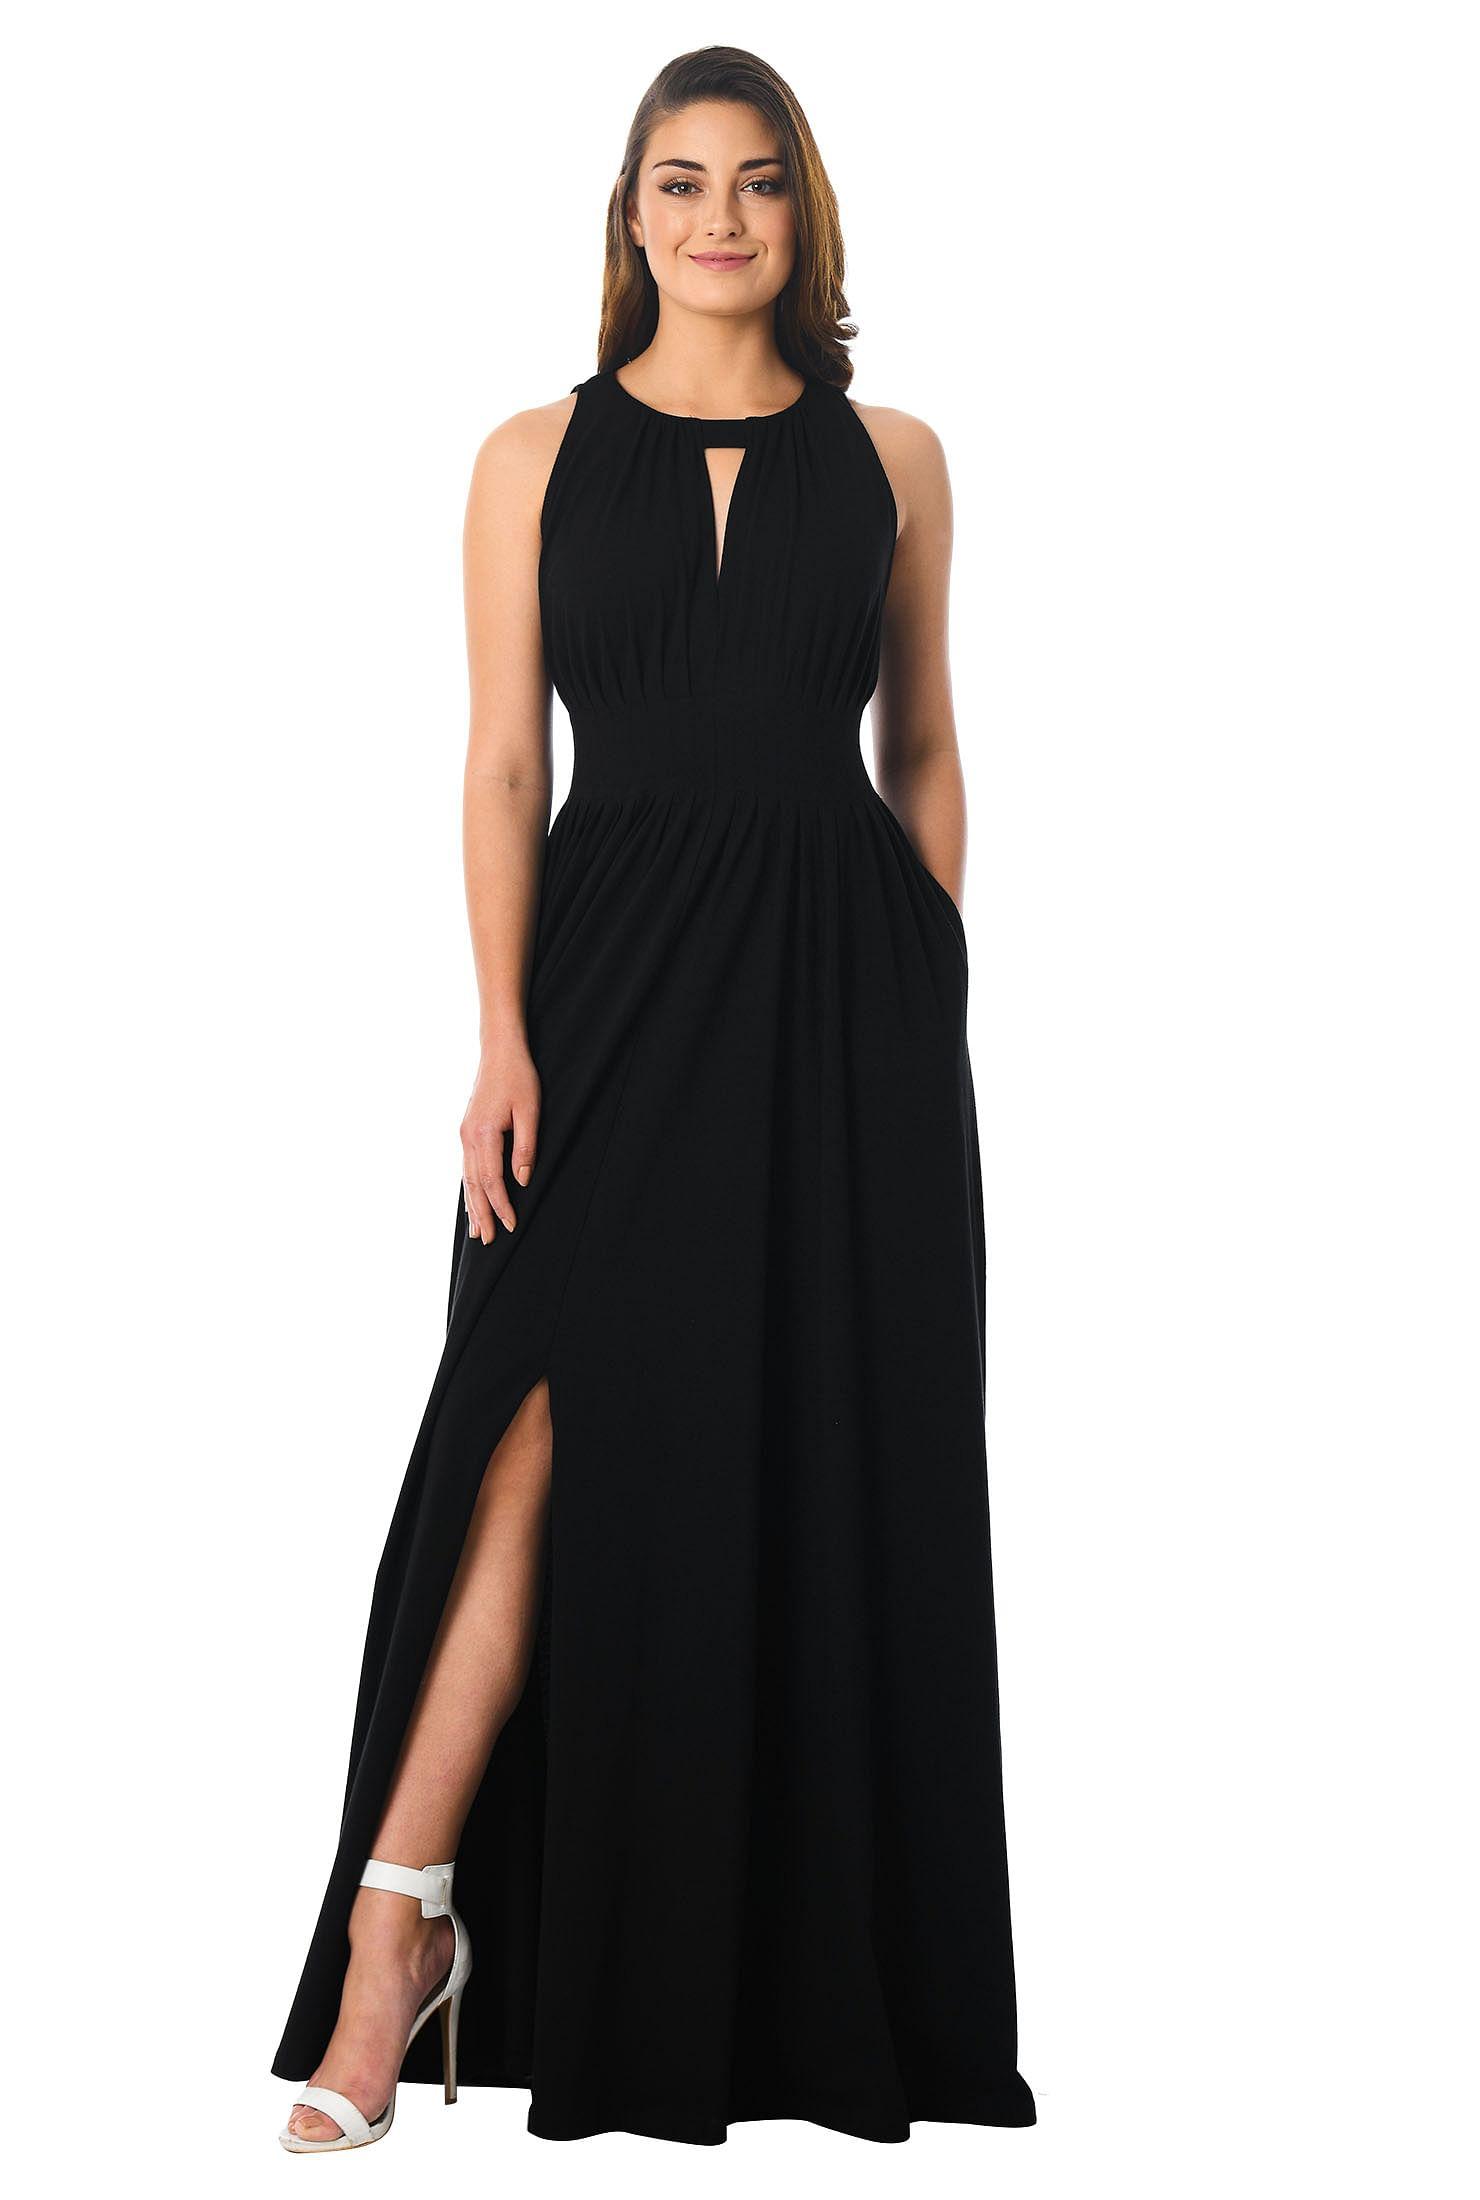 d26e28df7b1 ... jersey knit maxi dress. , banded jewel neck front dresses, black dresses,  cotton/spandex Dresses, Full